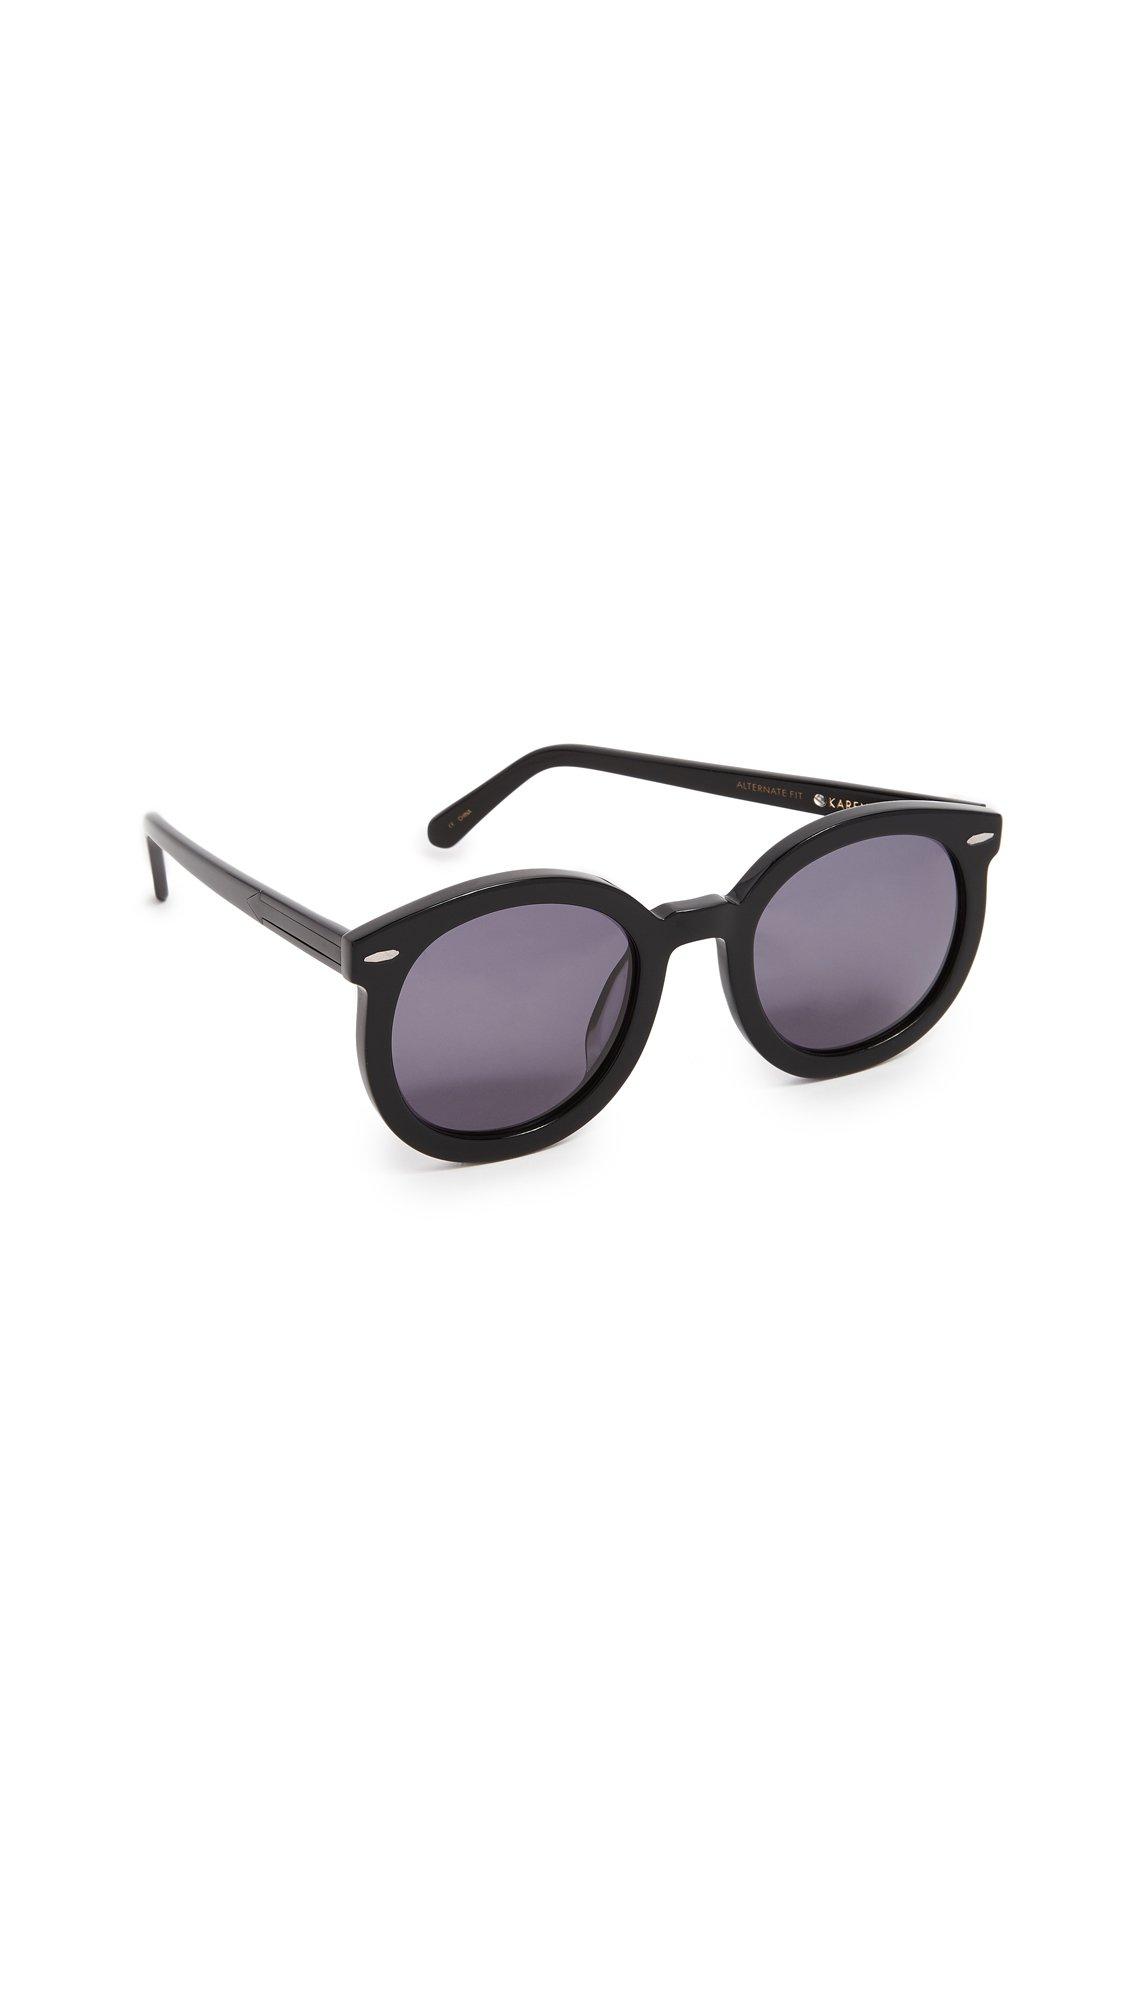 Karen Walker Women's Special Fit Super Duper Strength Sunglasses, Black/Smoke Mono, One Size